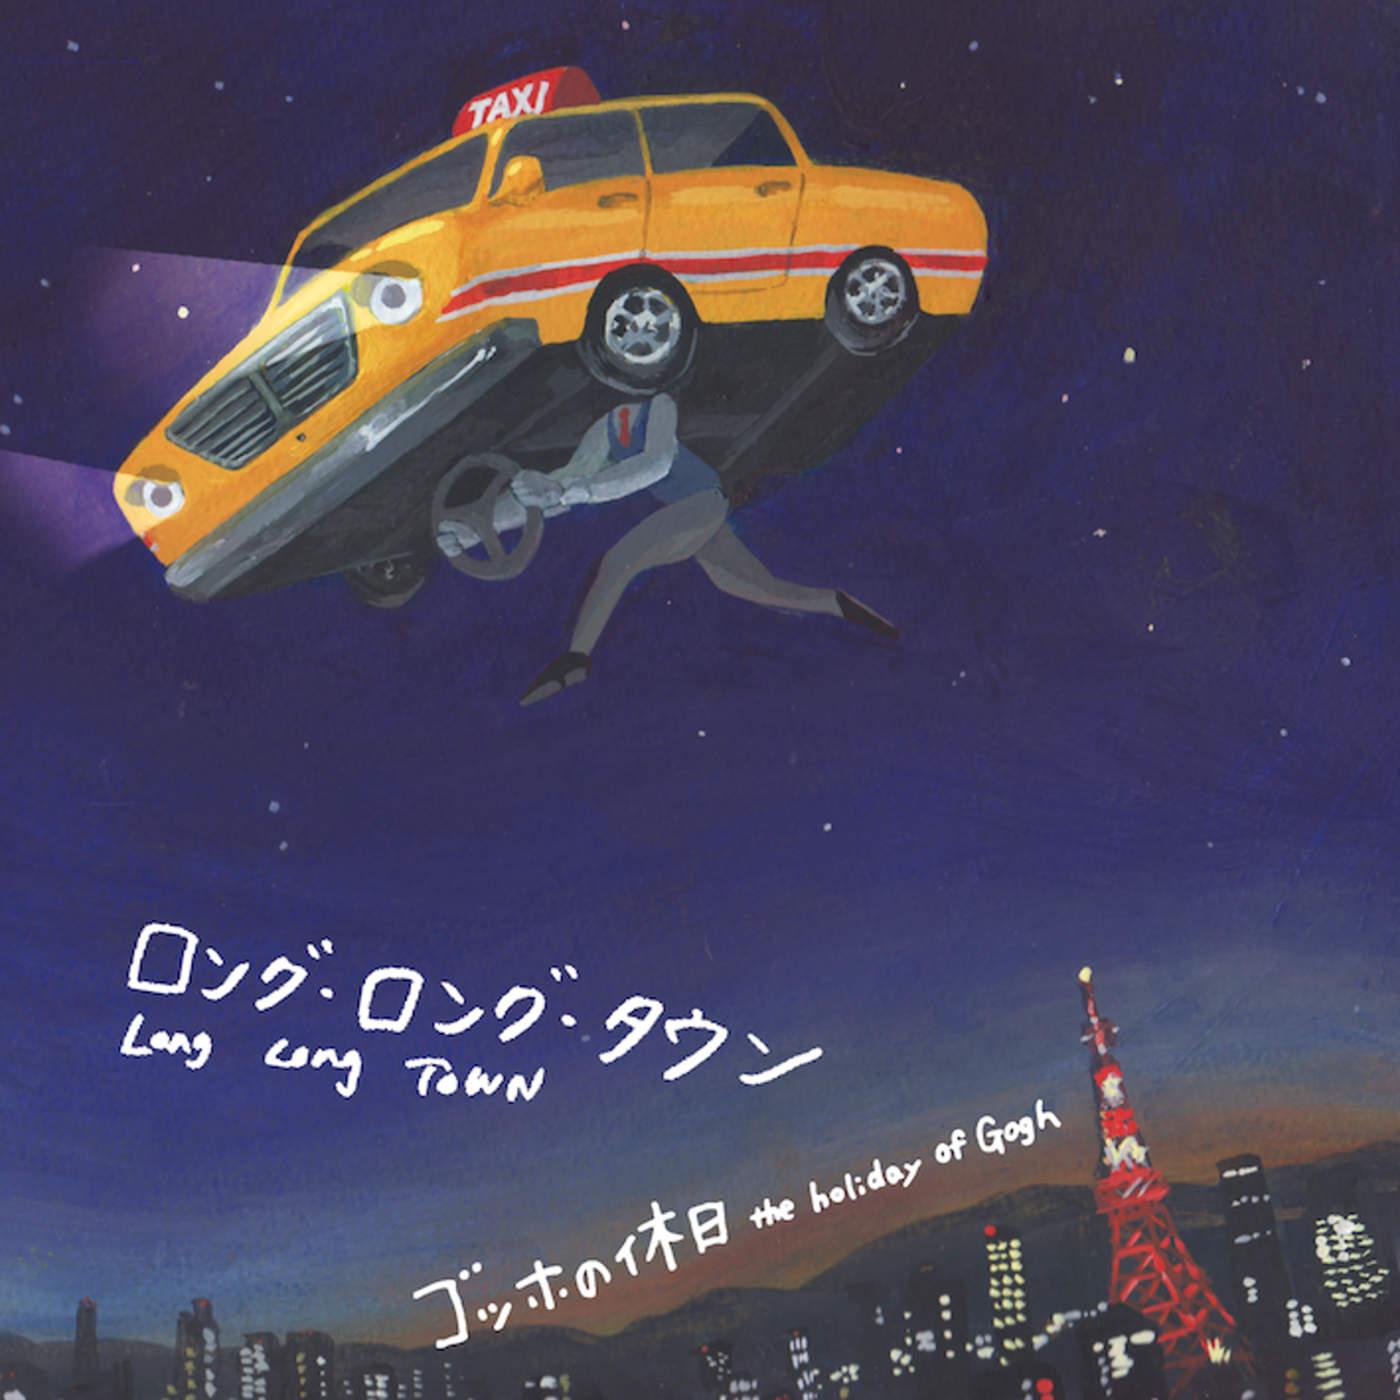 20160203.04.1 Gogh no Kyujitsu - Long Long Town cover.jpg